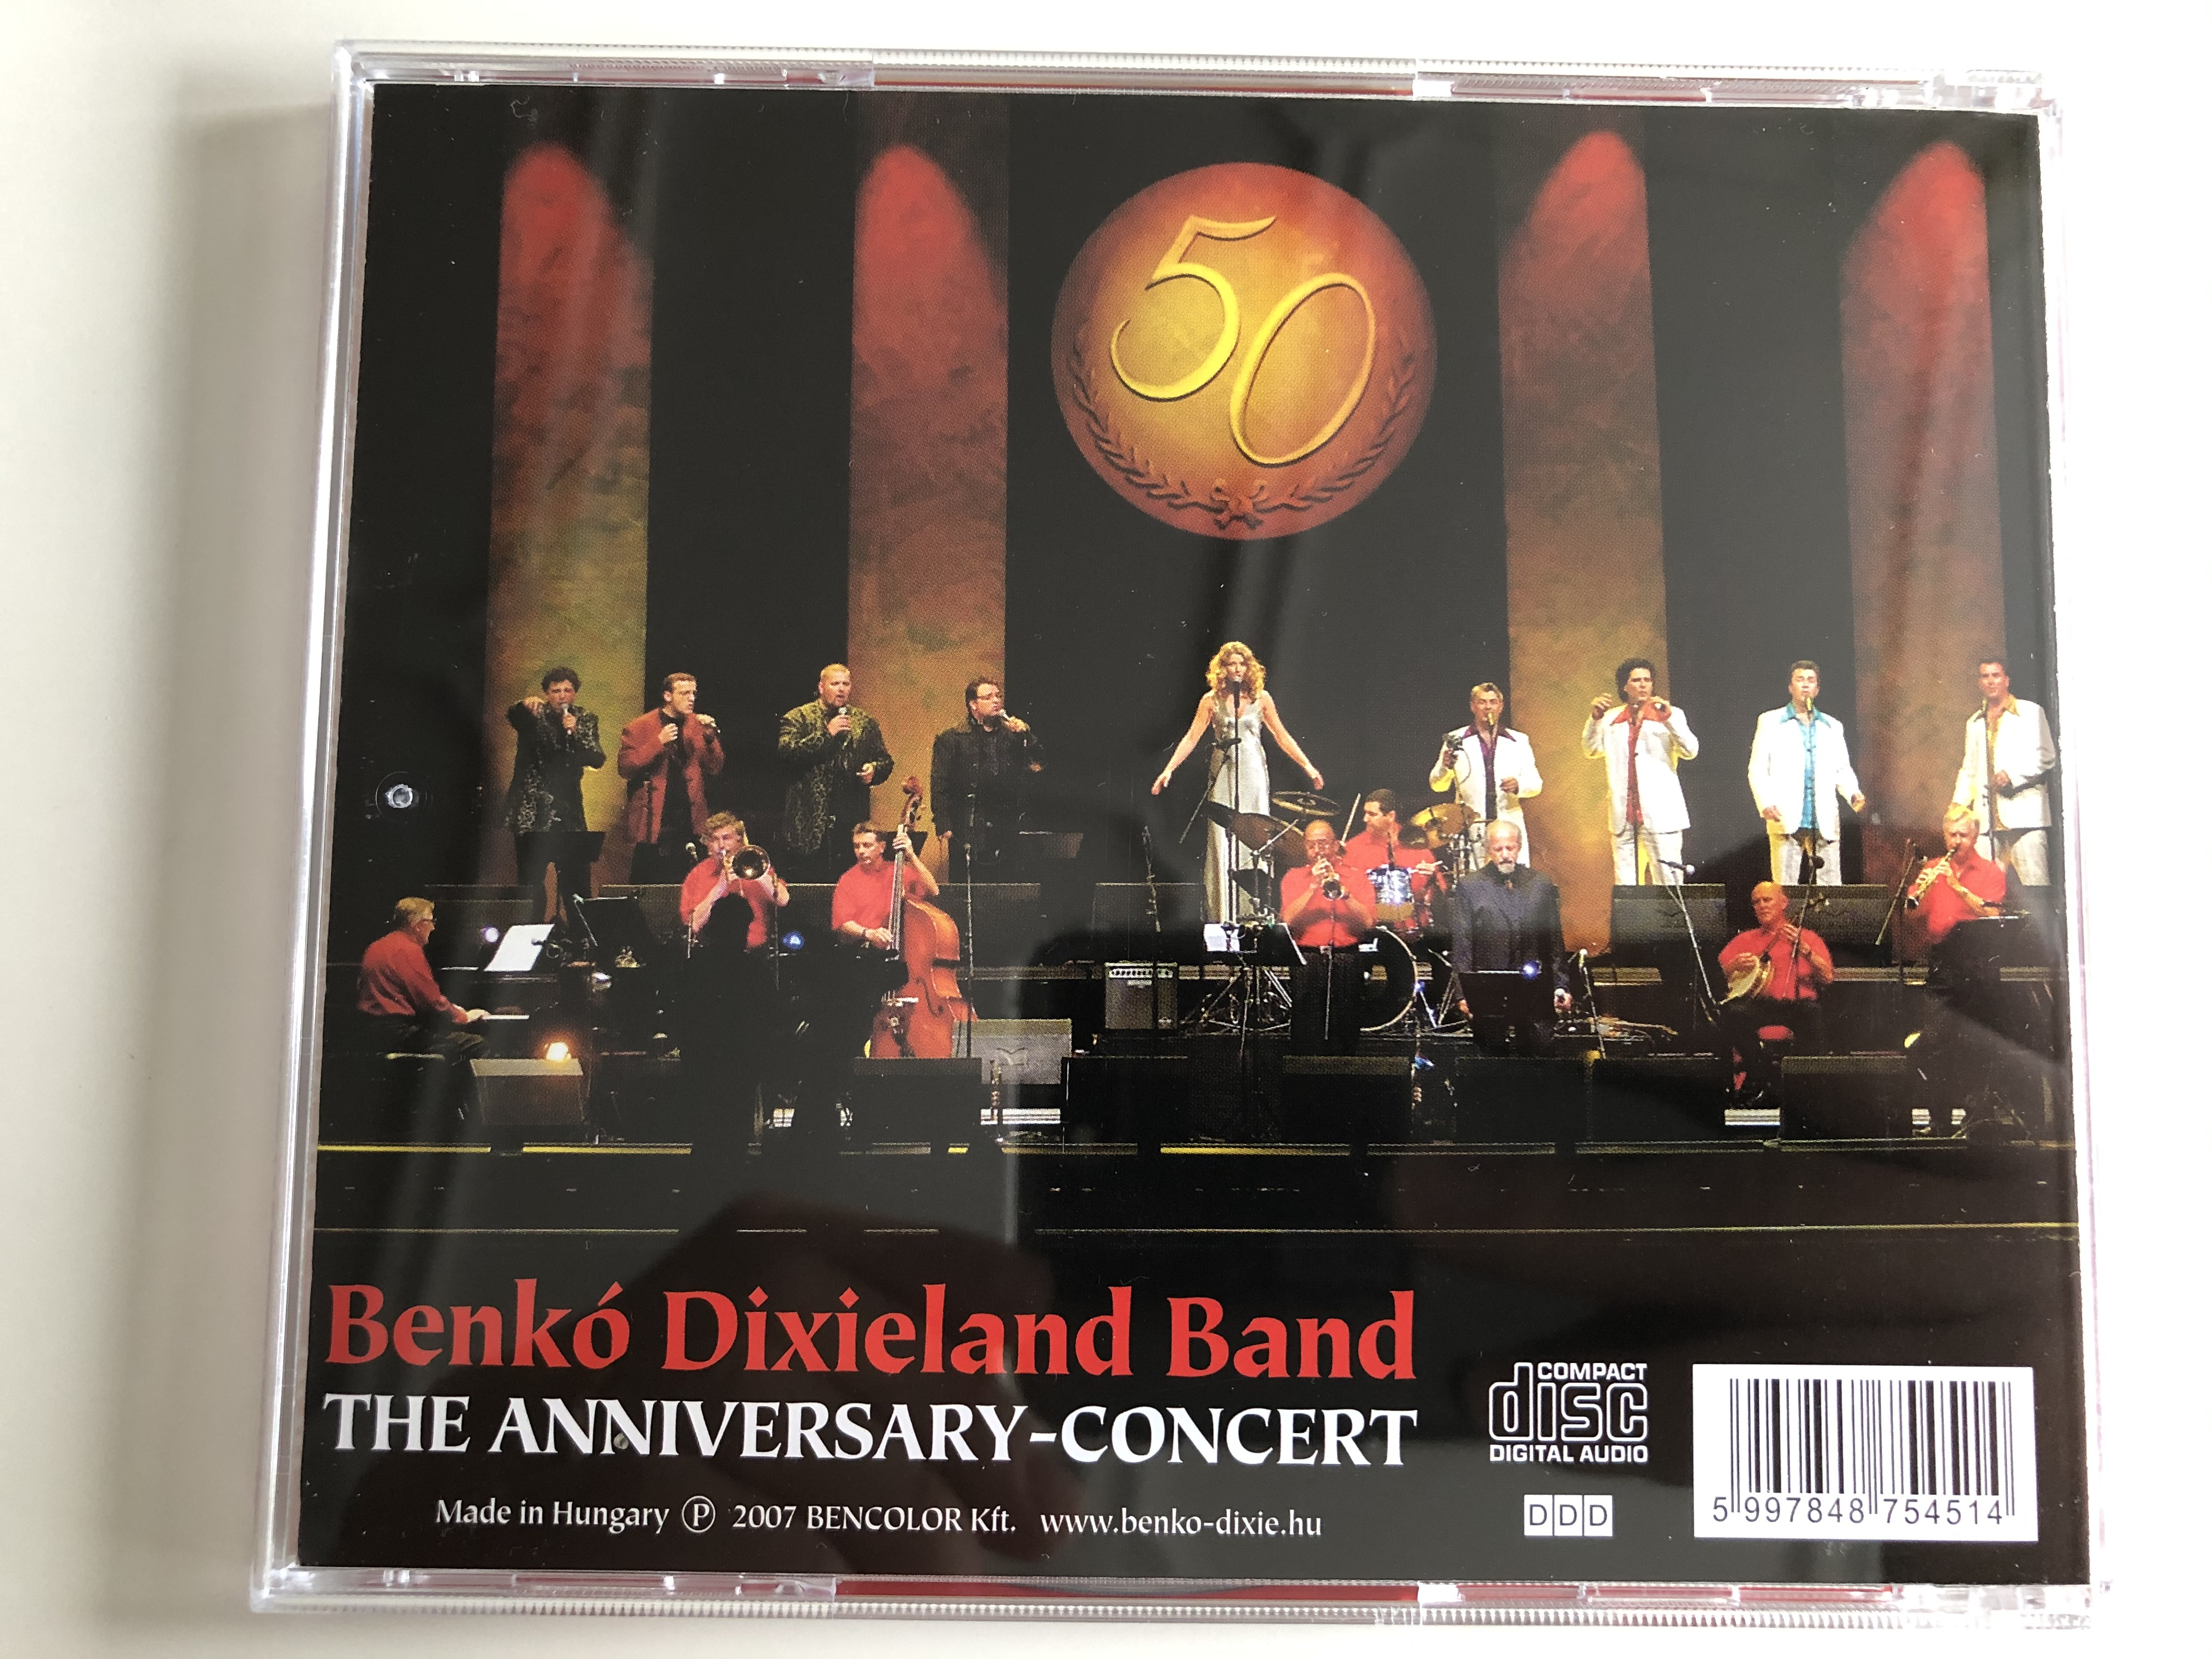 benk-dixieland-band-live-recorded-at-budapest-sportatrena-5nd-may-2007-the-anisversary-concert-bencolor-kft.-audio-cd-2007-stereo-ben-cd-5451-6-.jpg